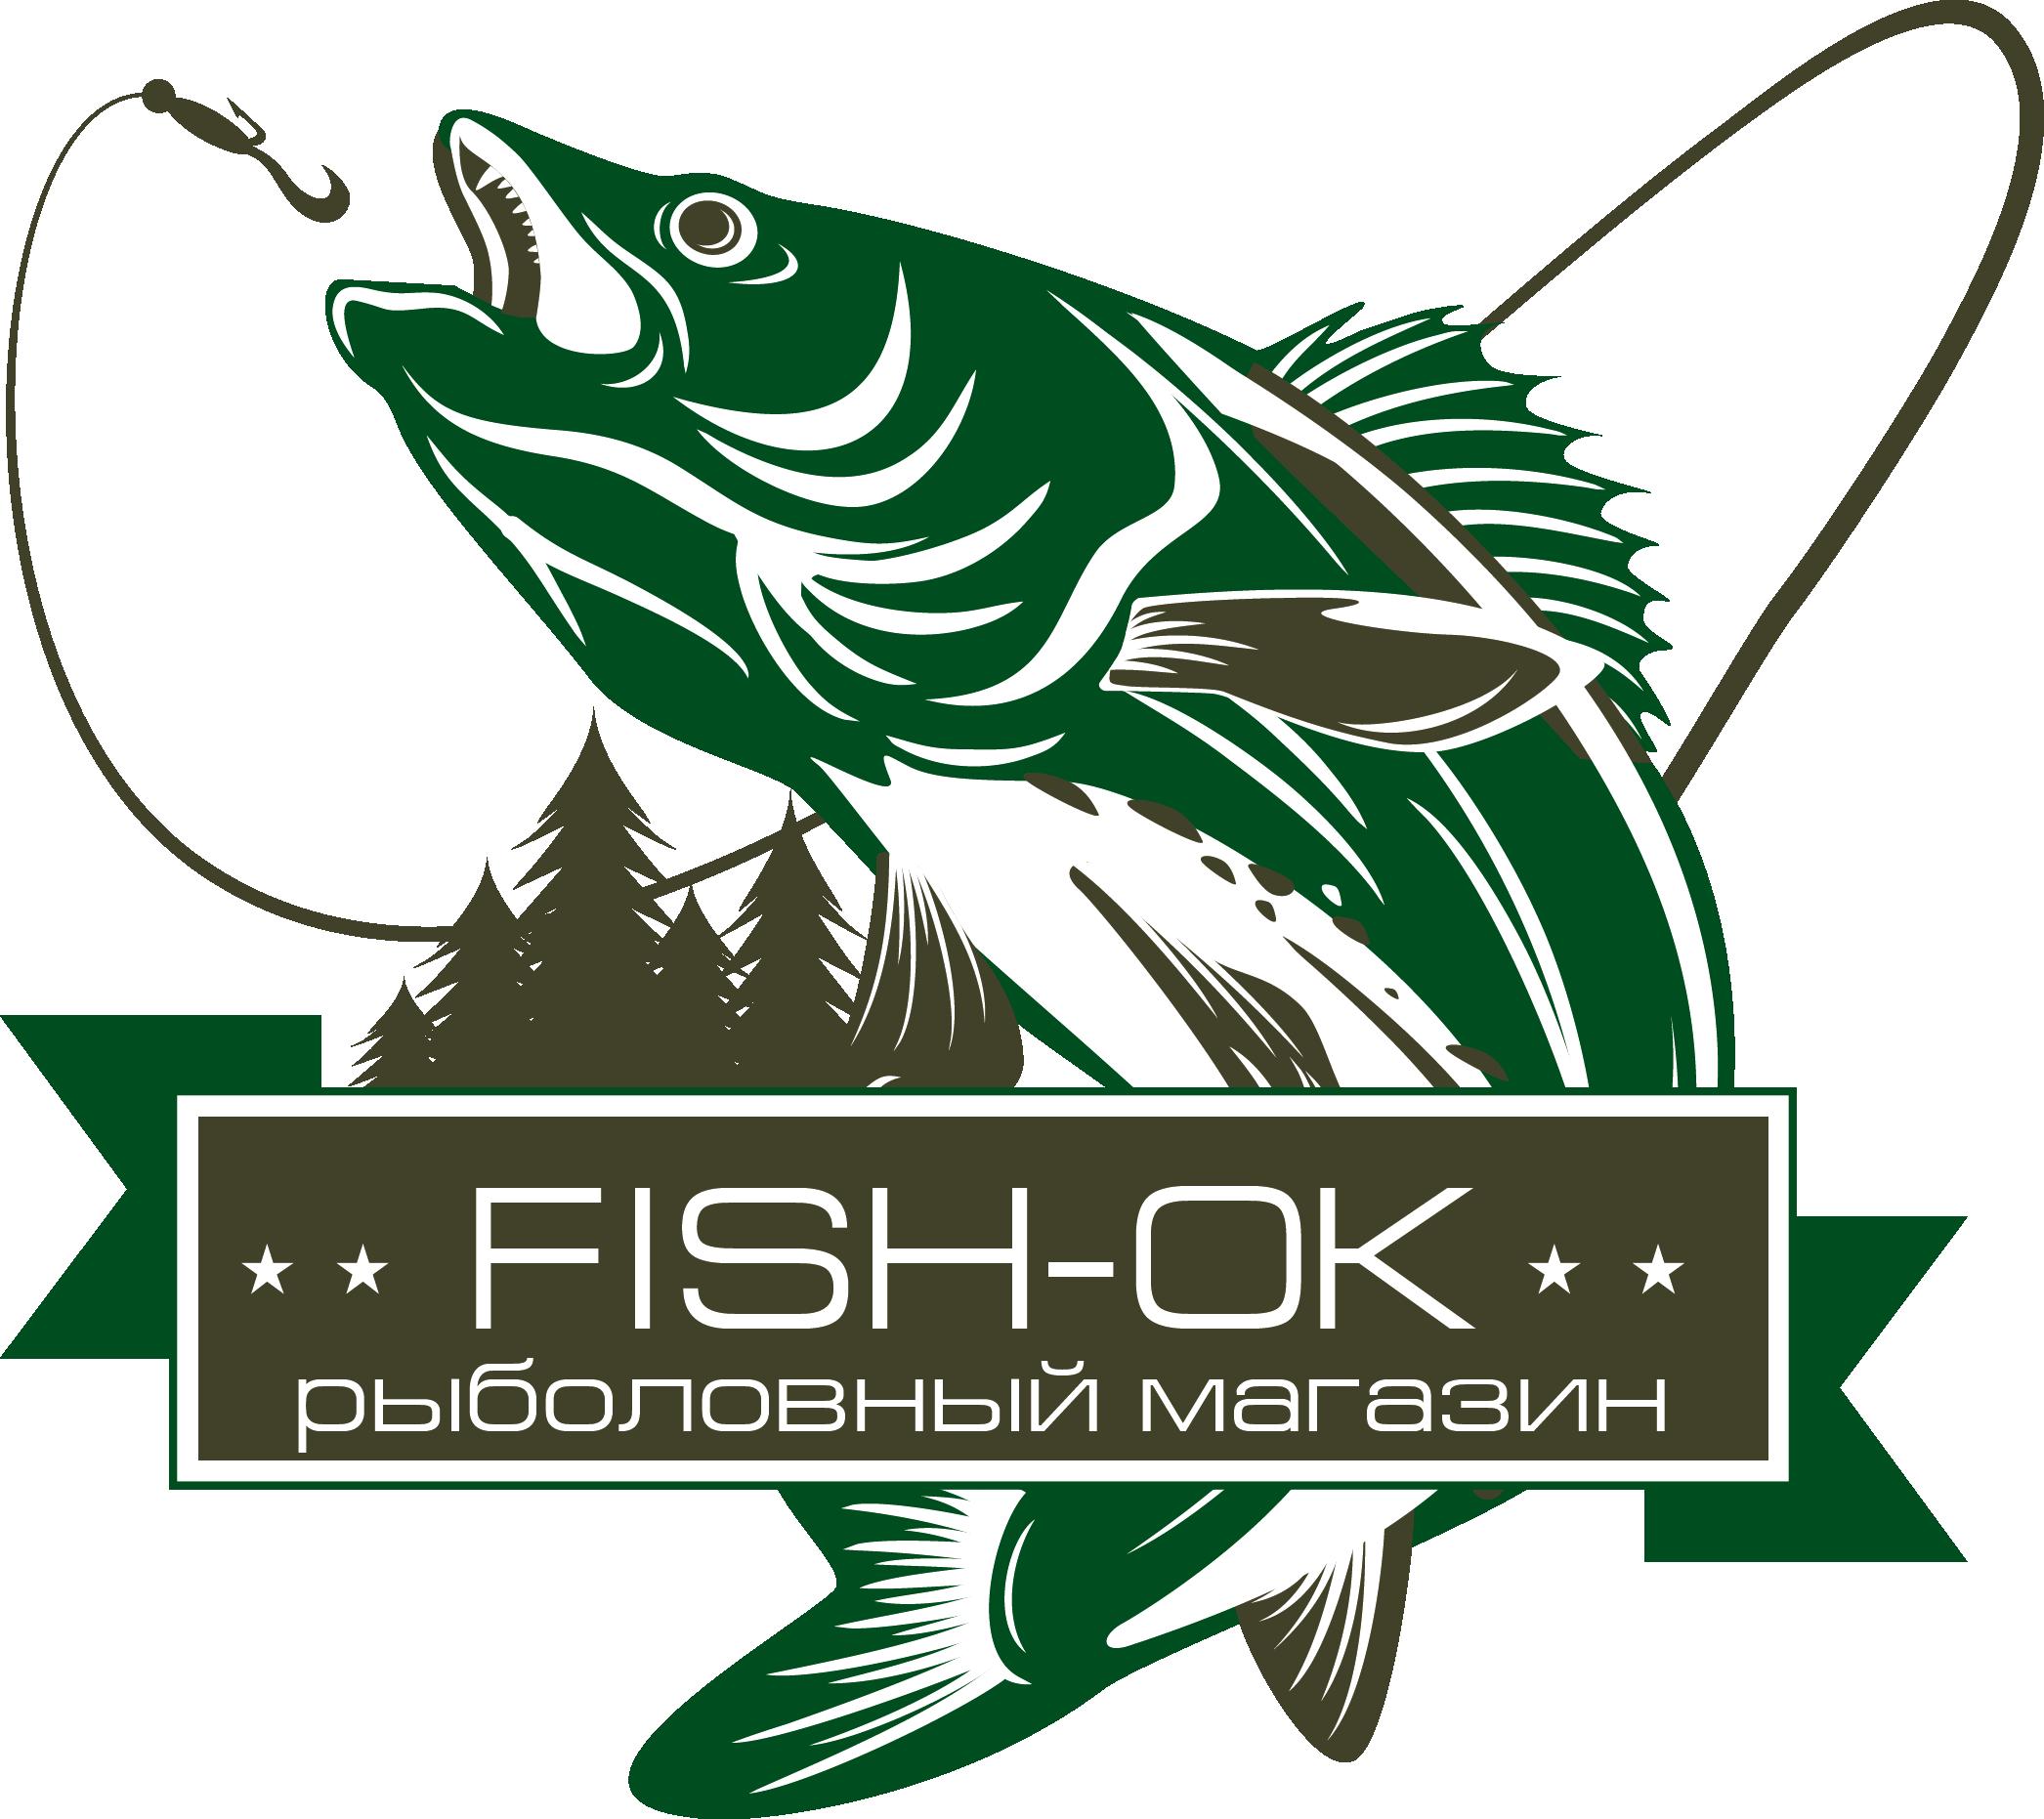 FISH-OK